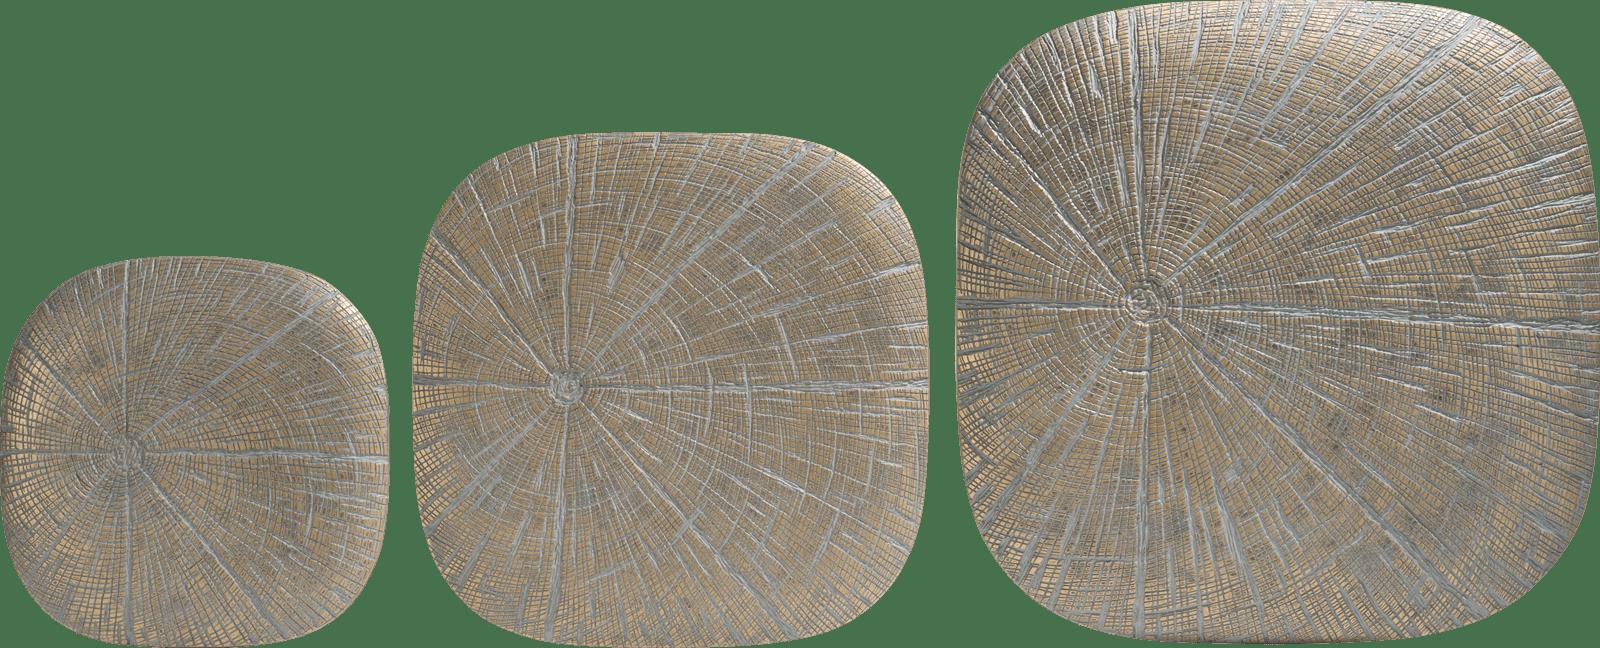 Coco Maison - wanddeco lena - set van 3 - goud